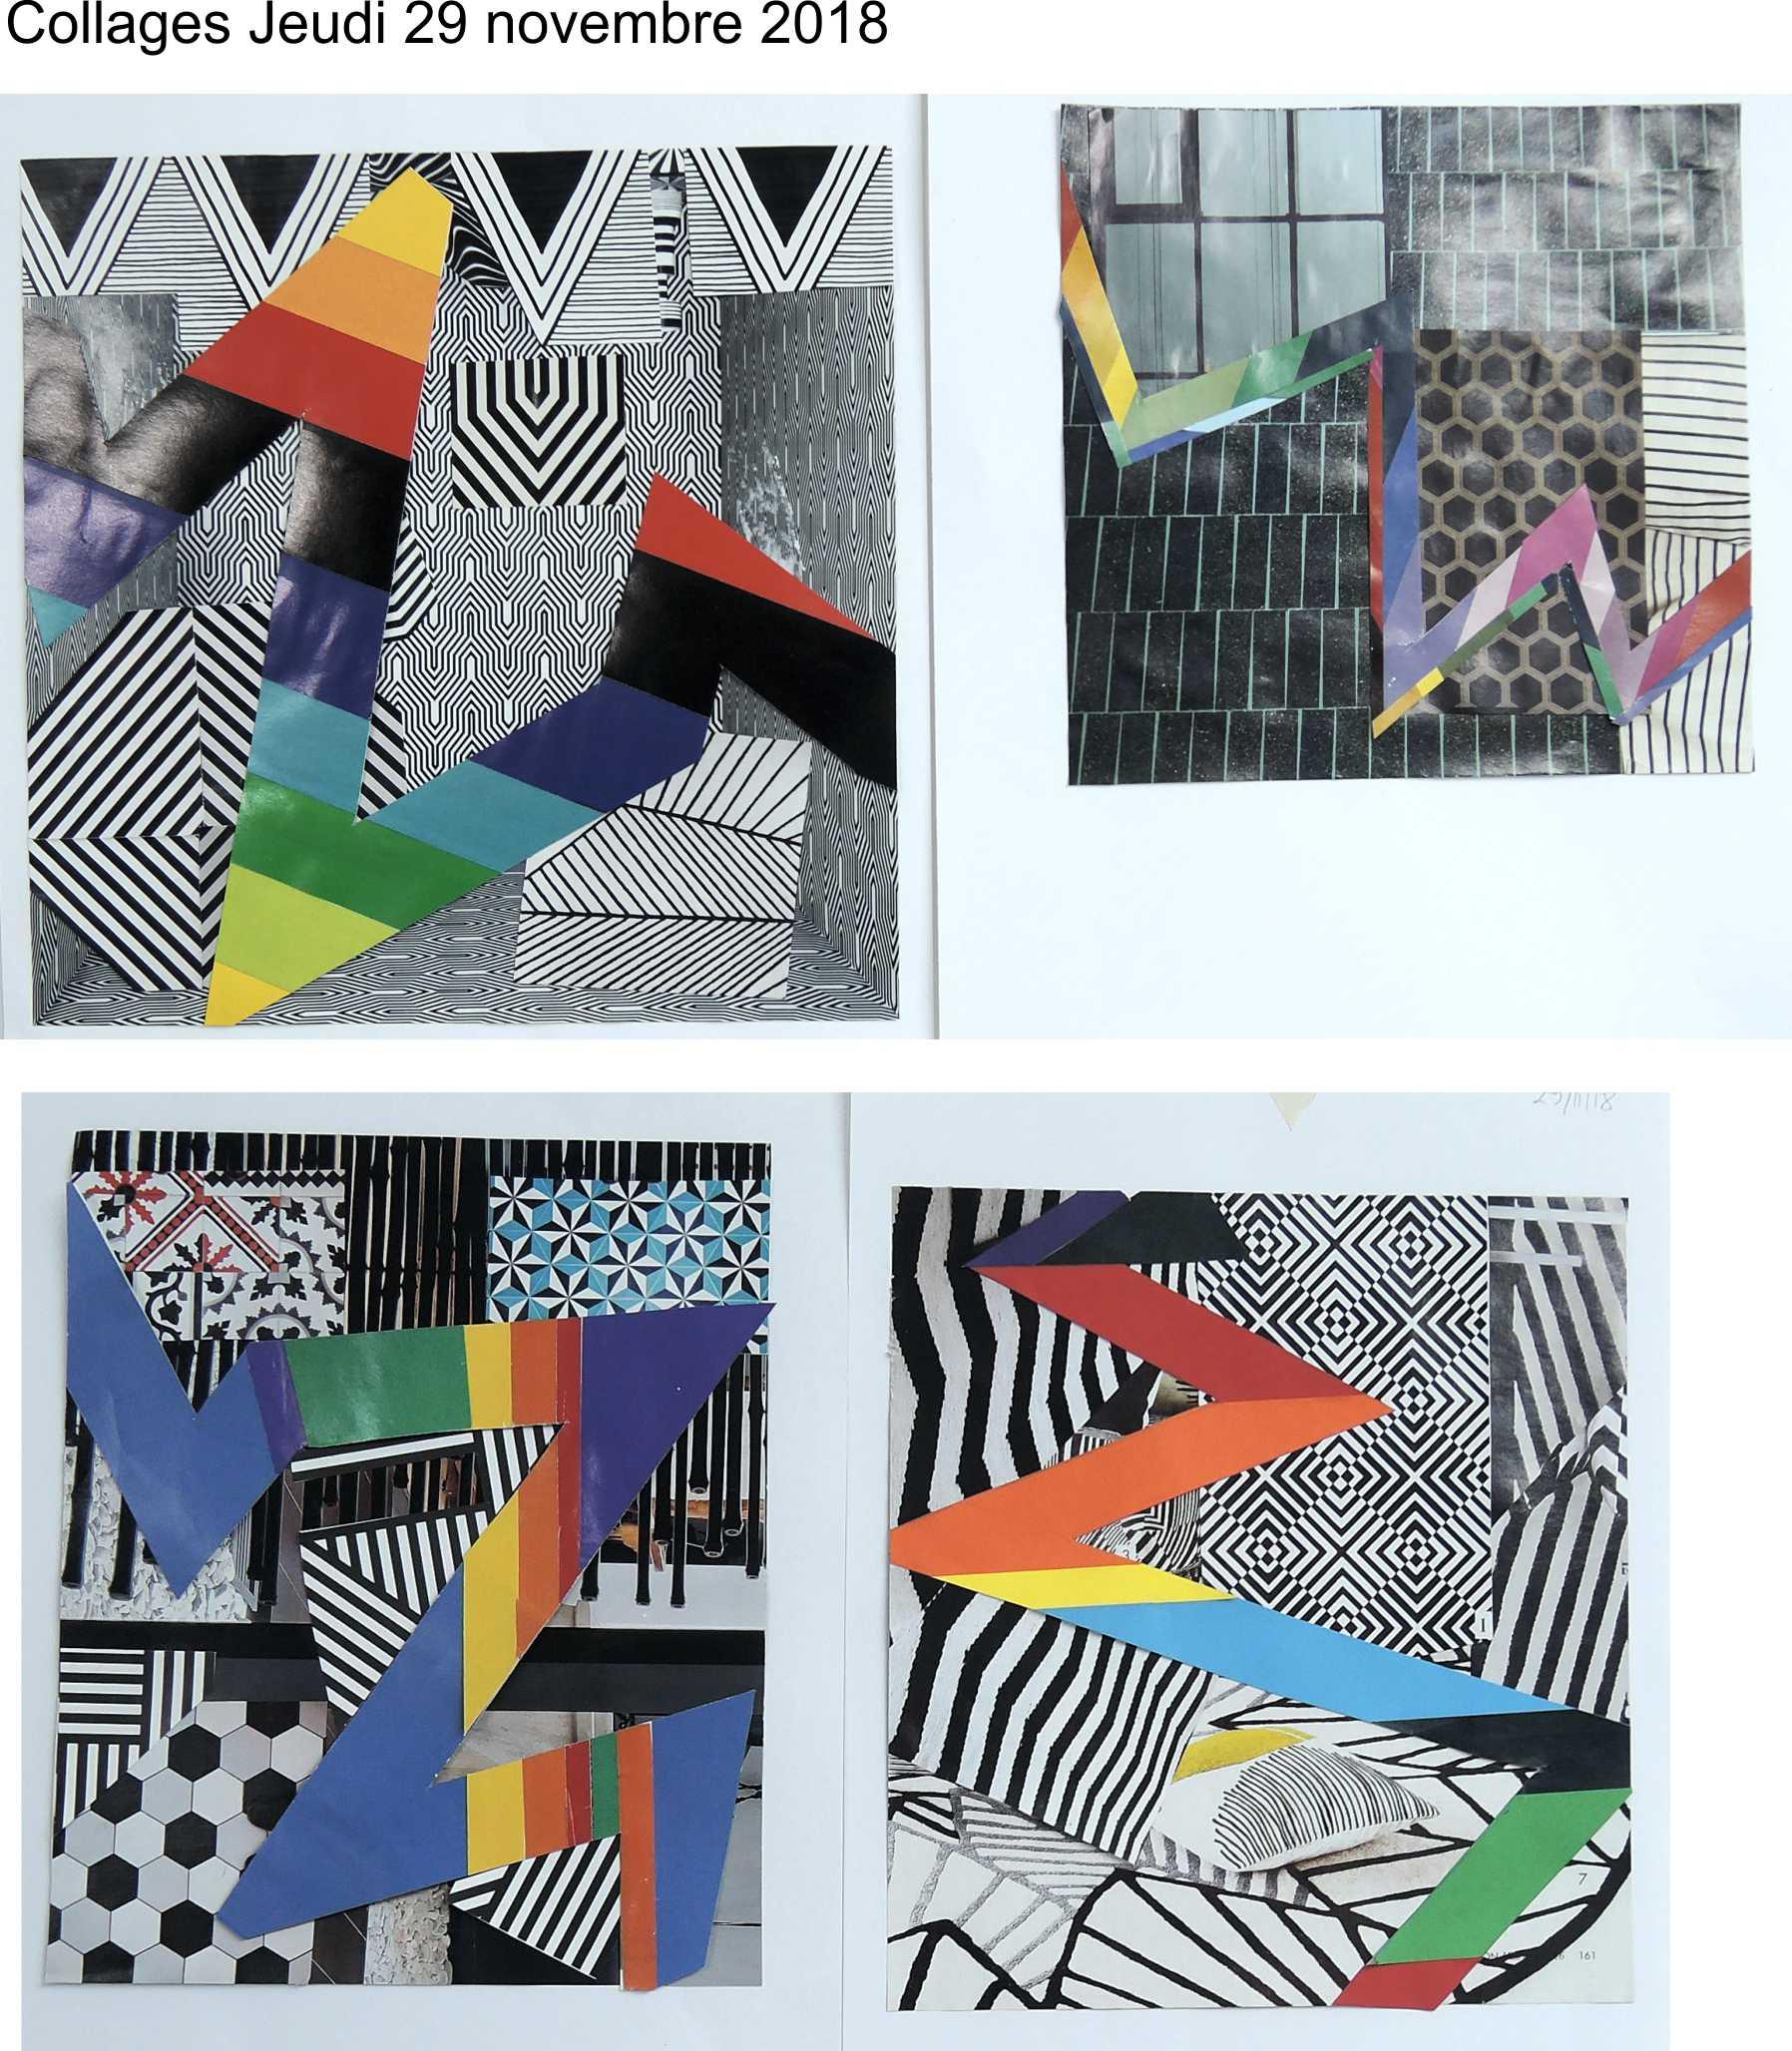 Collages Pantone jeudi 29 novembre 2018